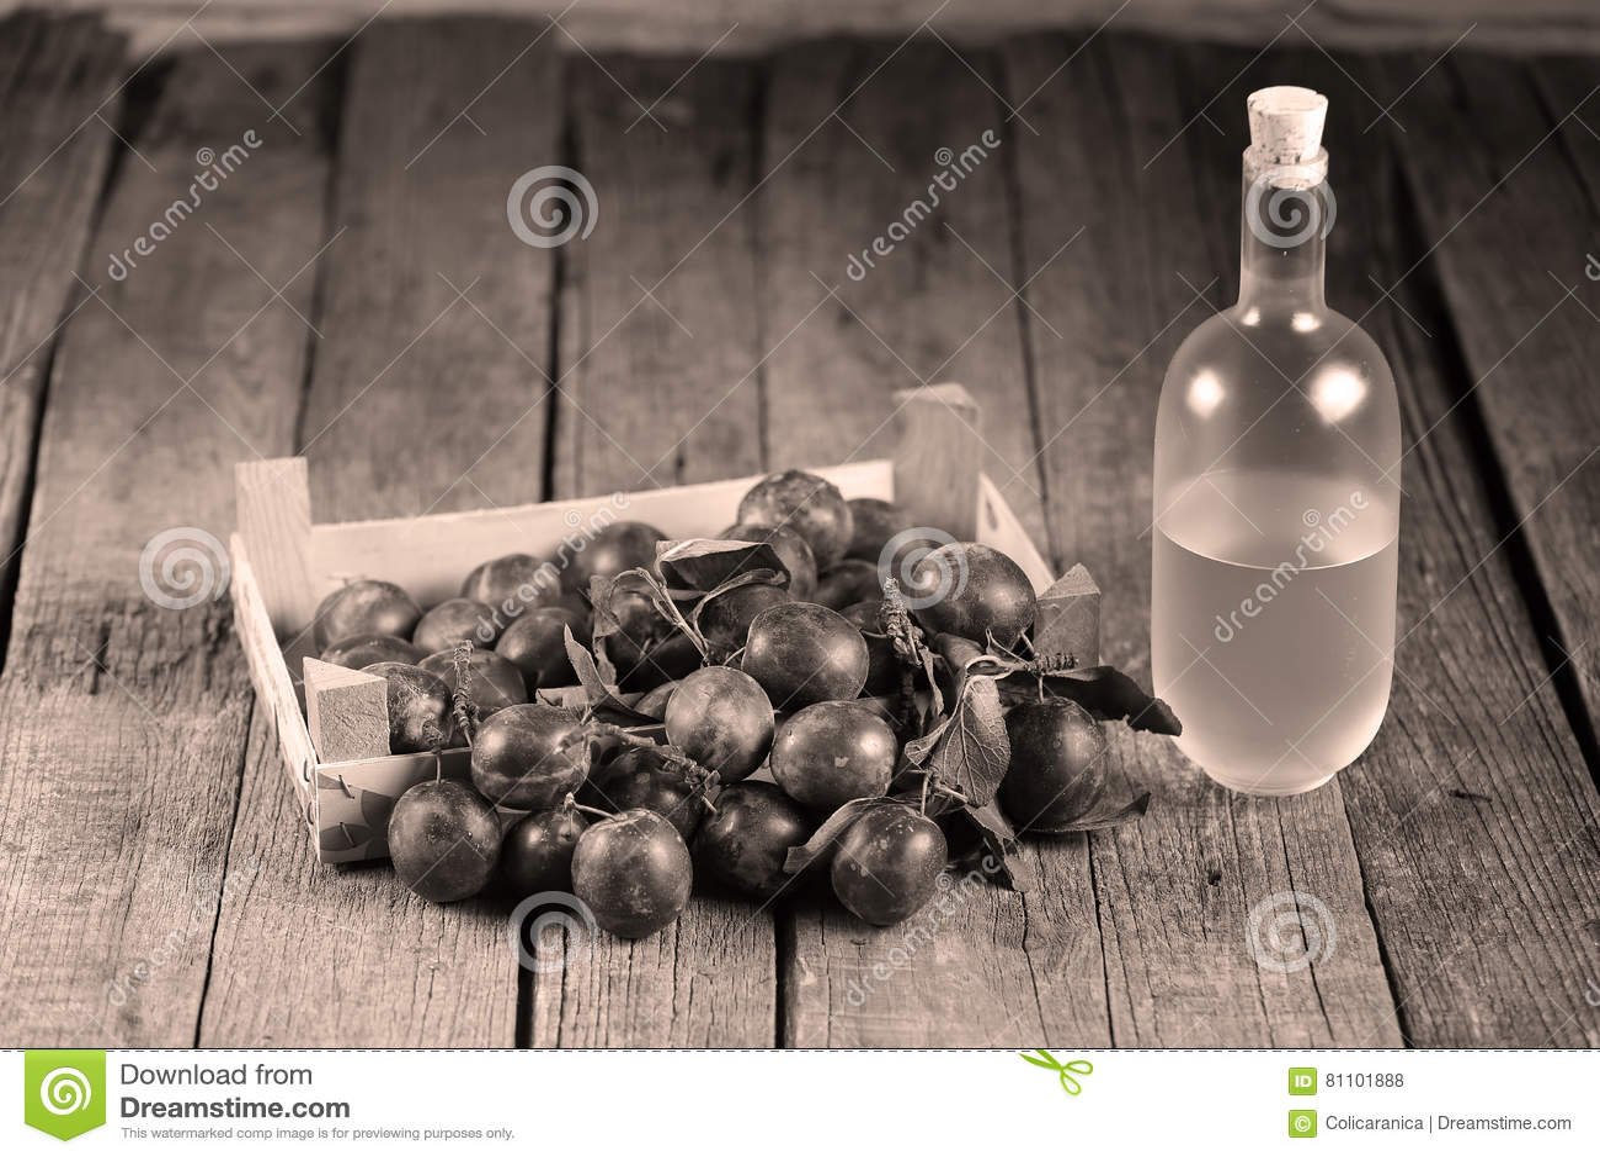 Plumb brandy, Romanian tuica